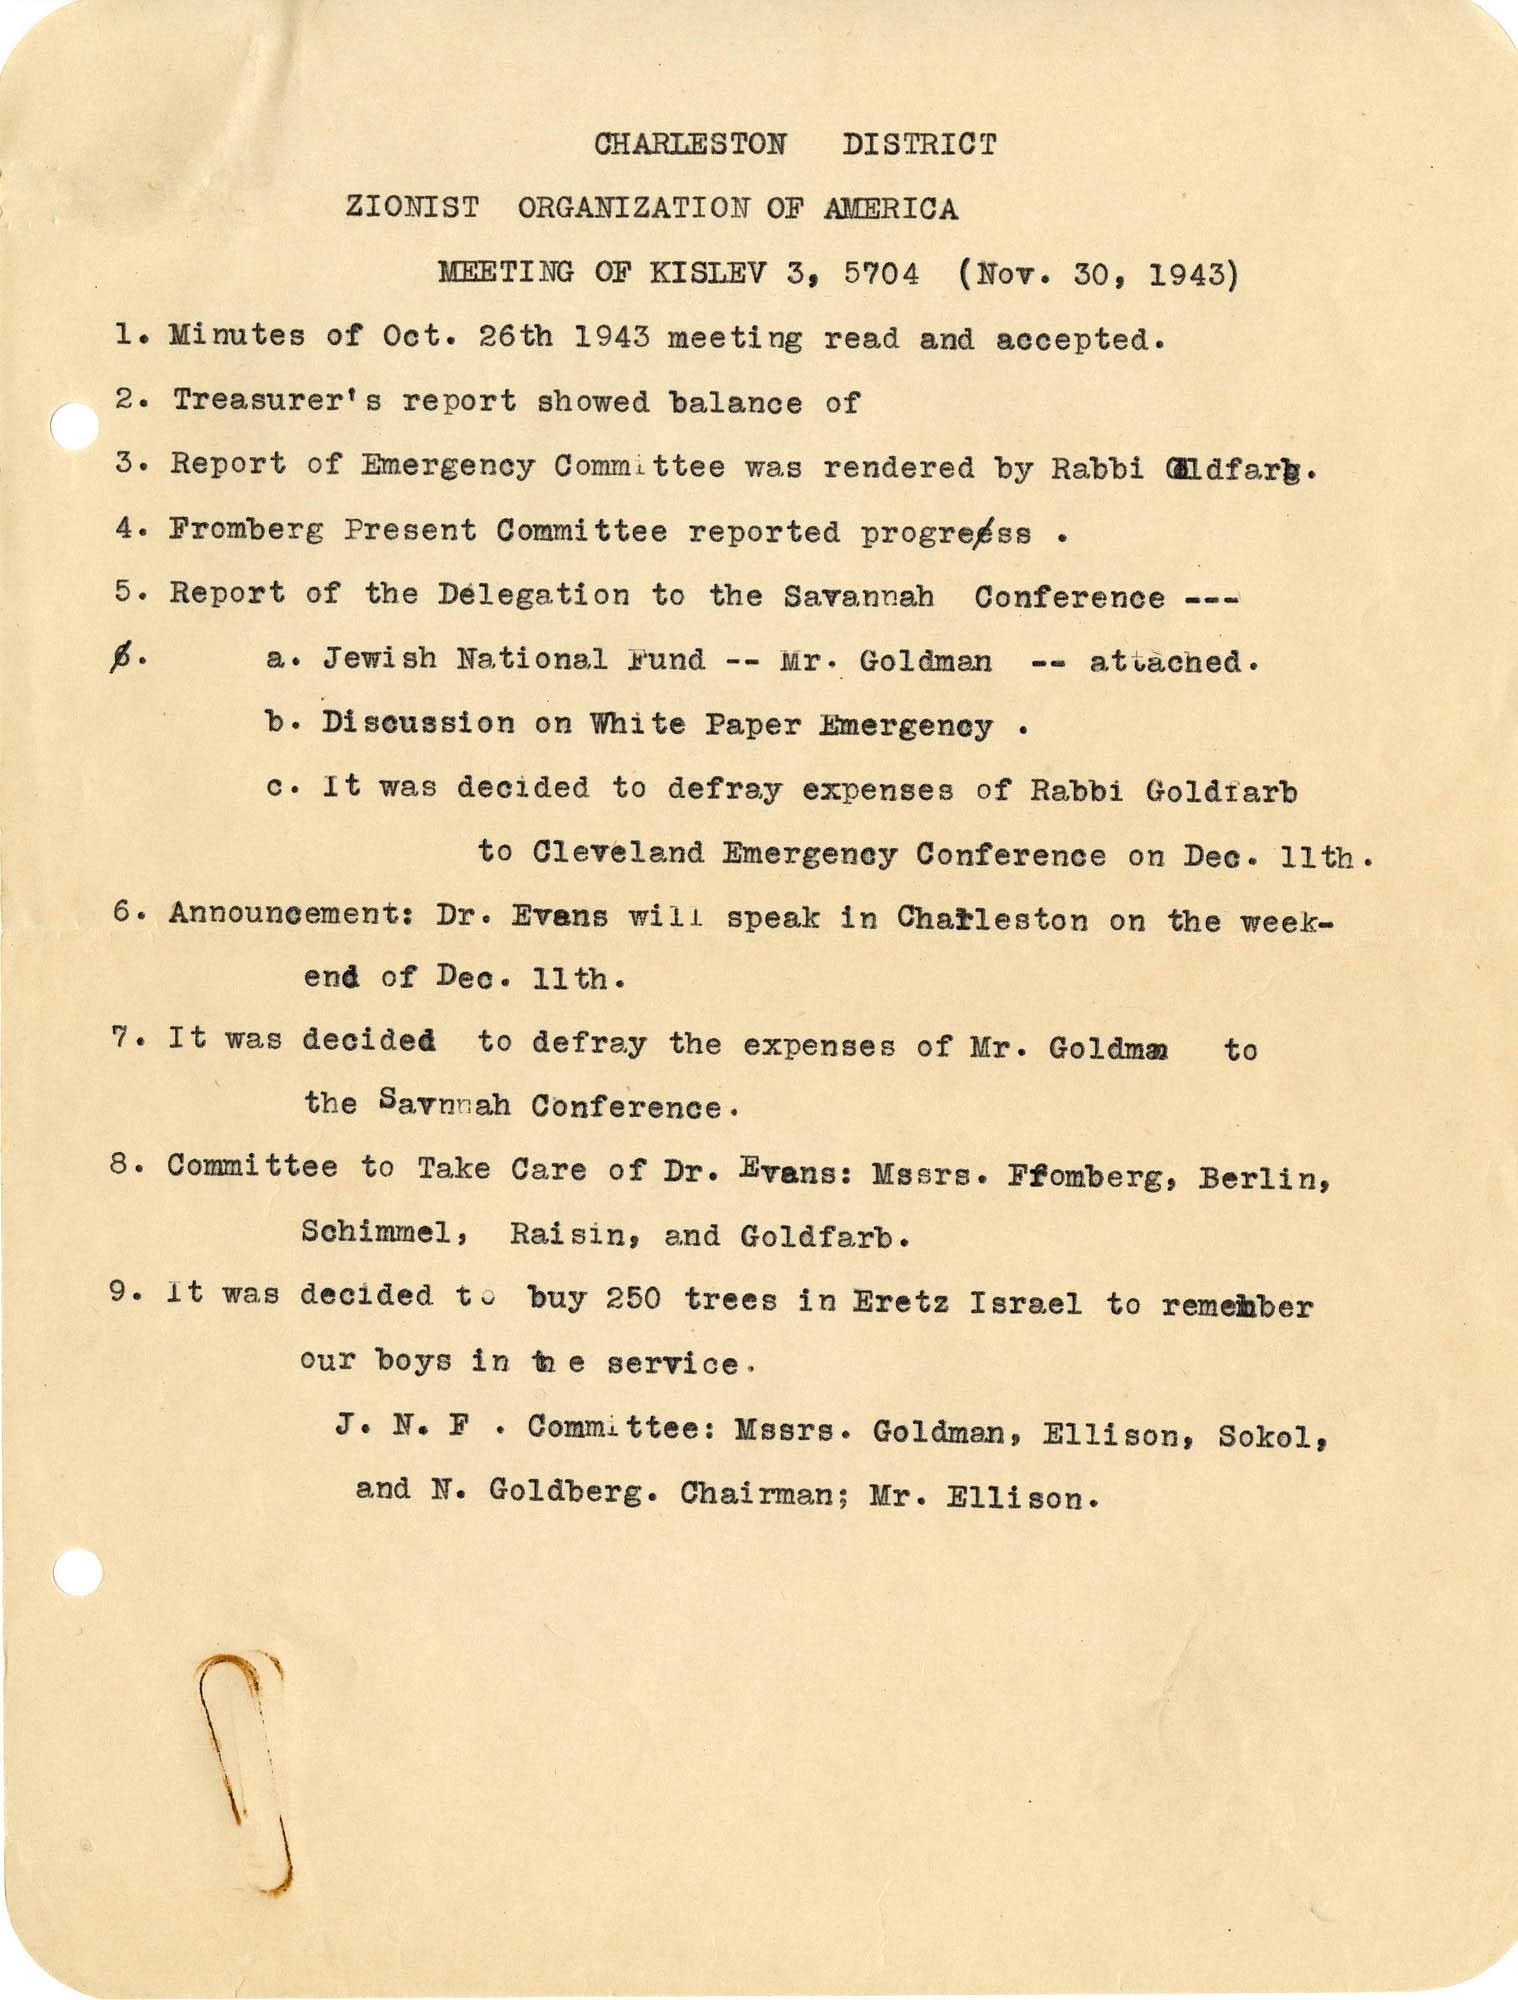 16. November 30, 1943 Minutes